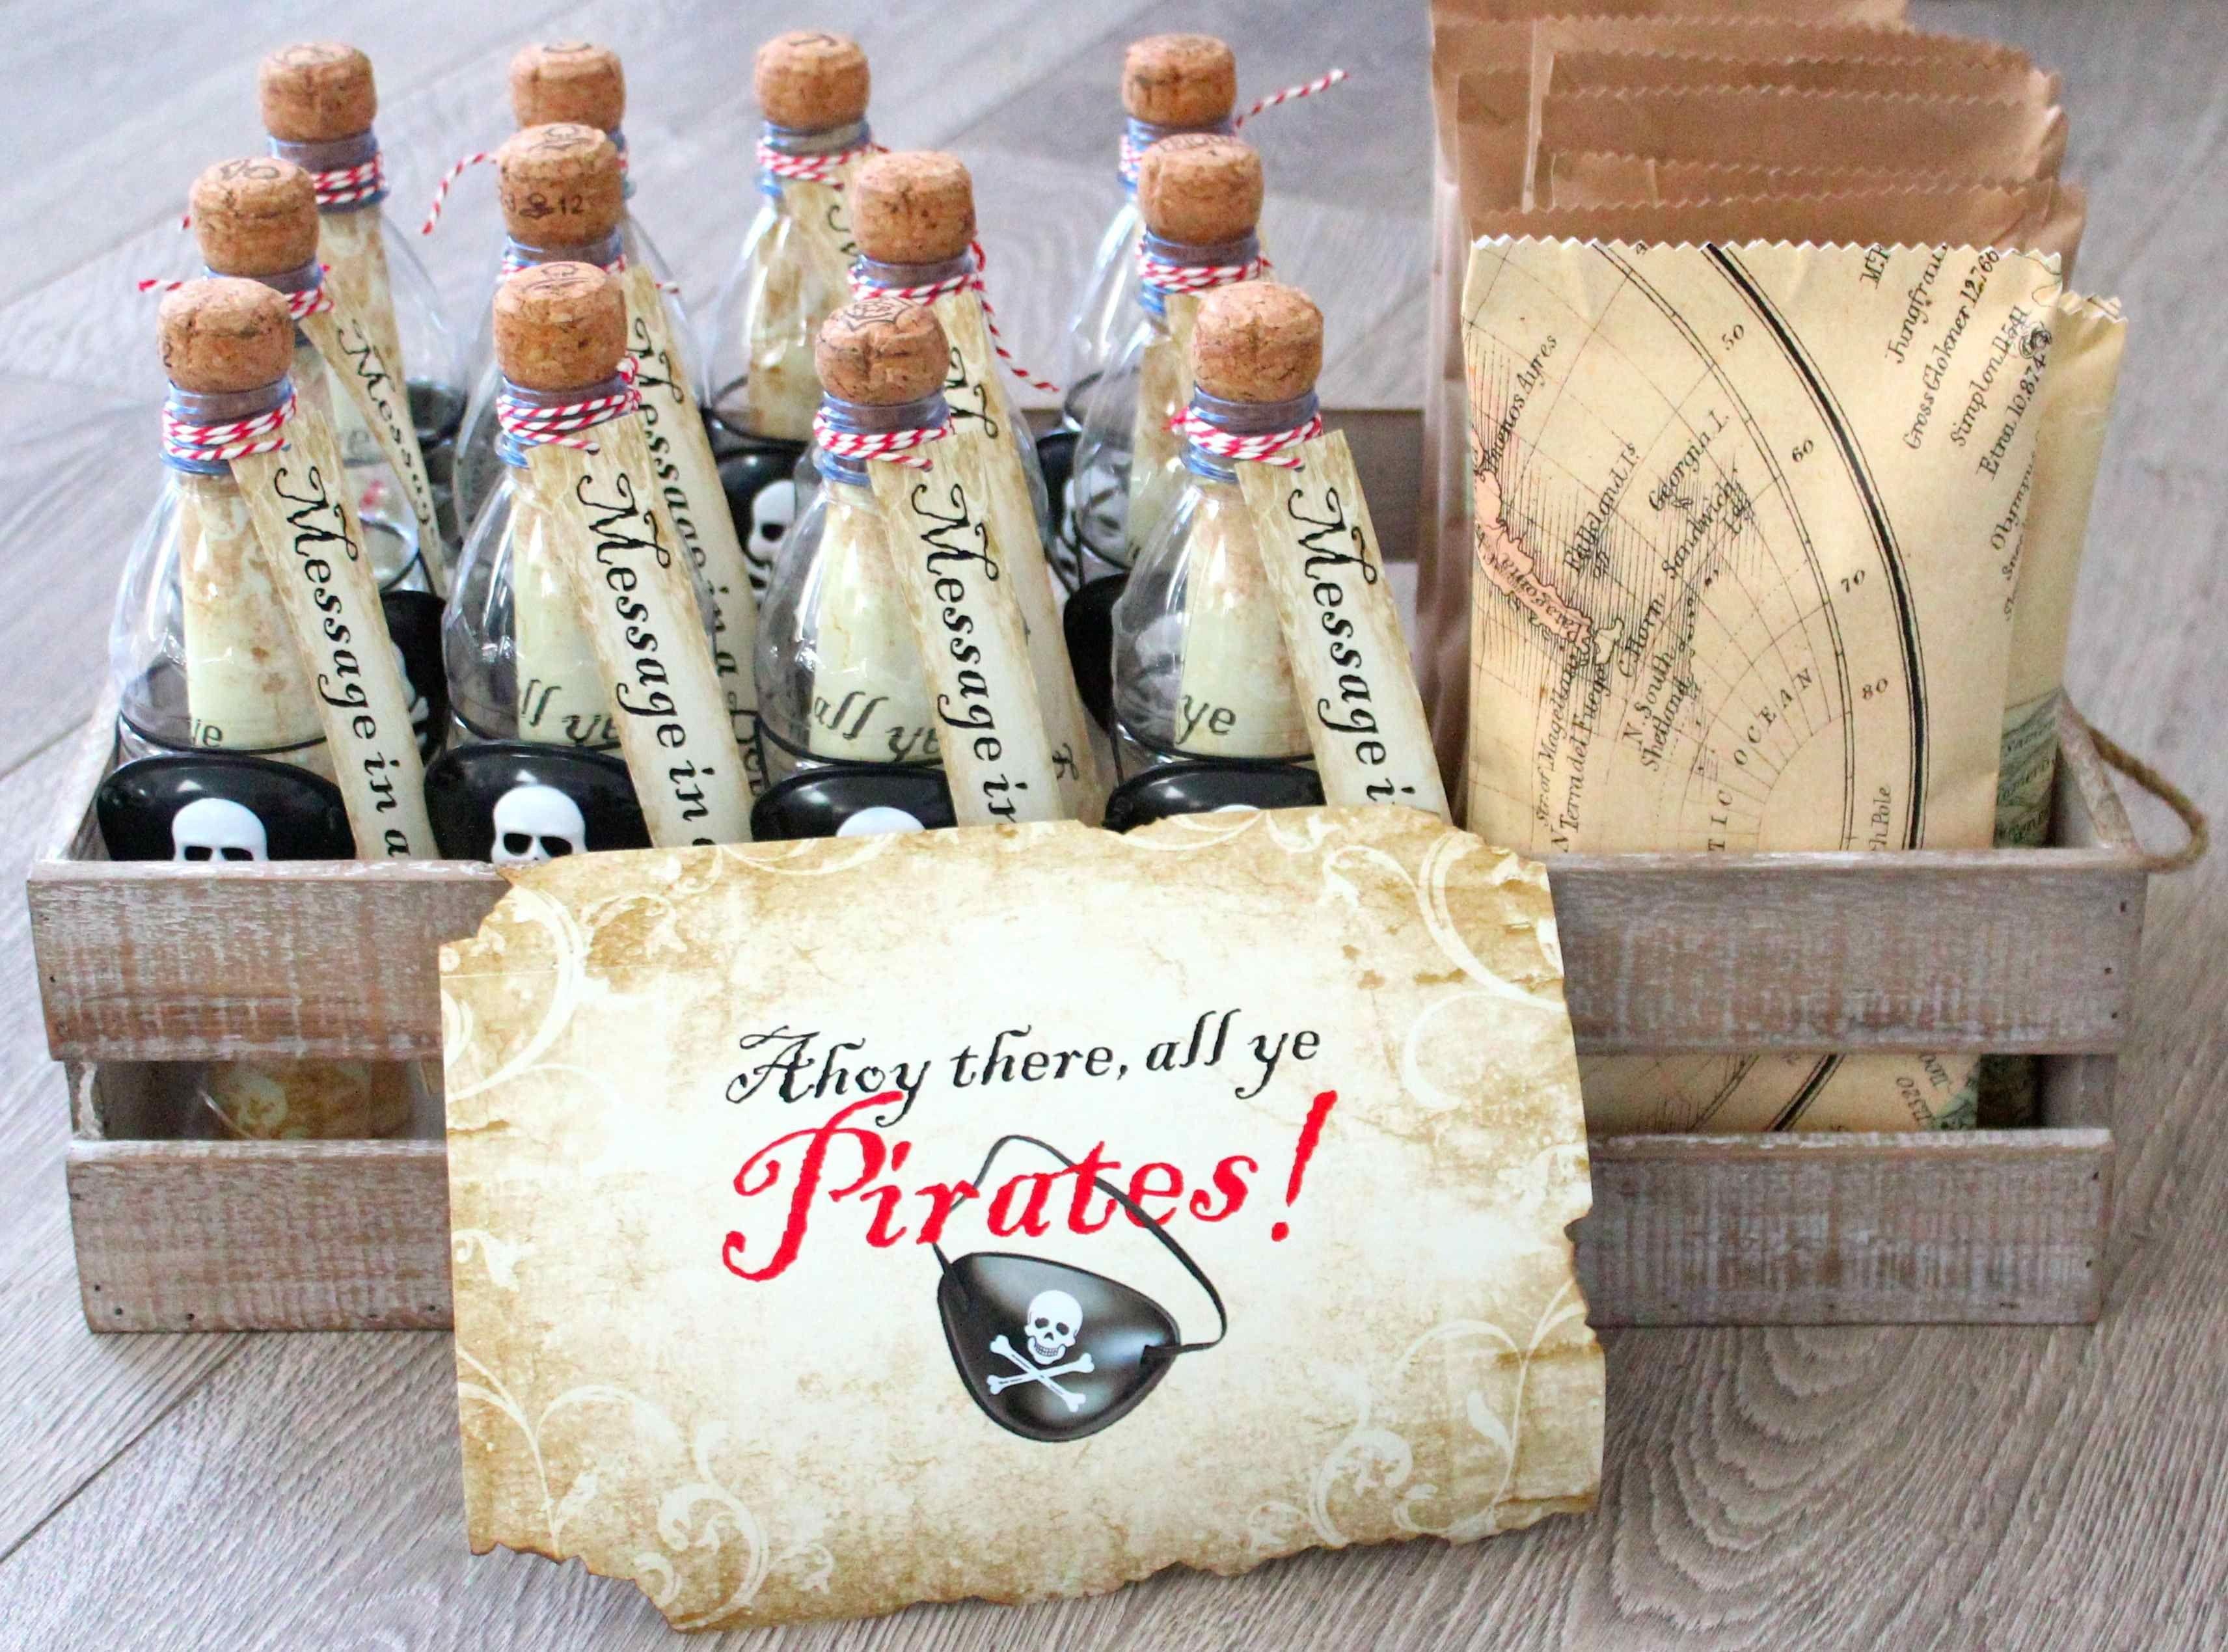 Invite ideas | Pirate party ideas | Pinterest